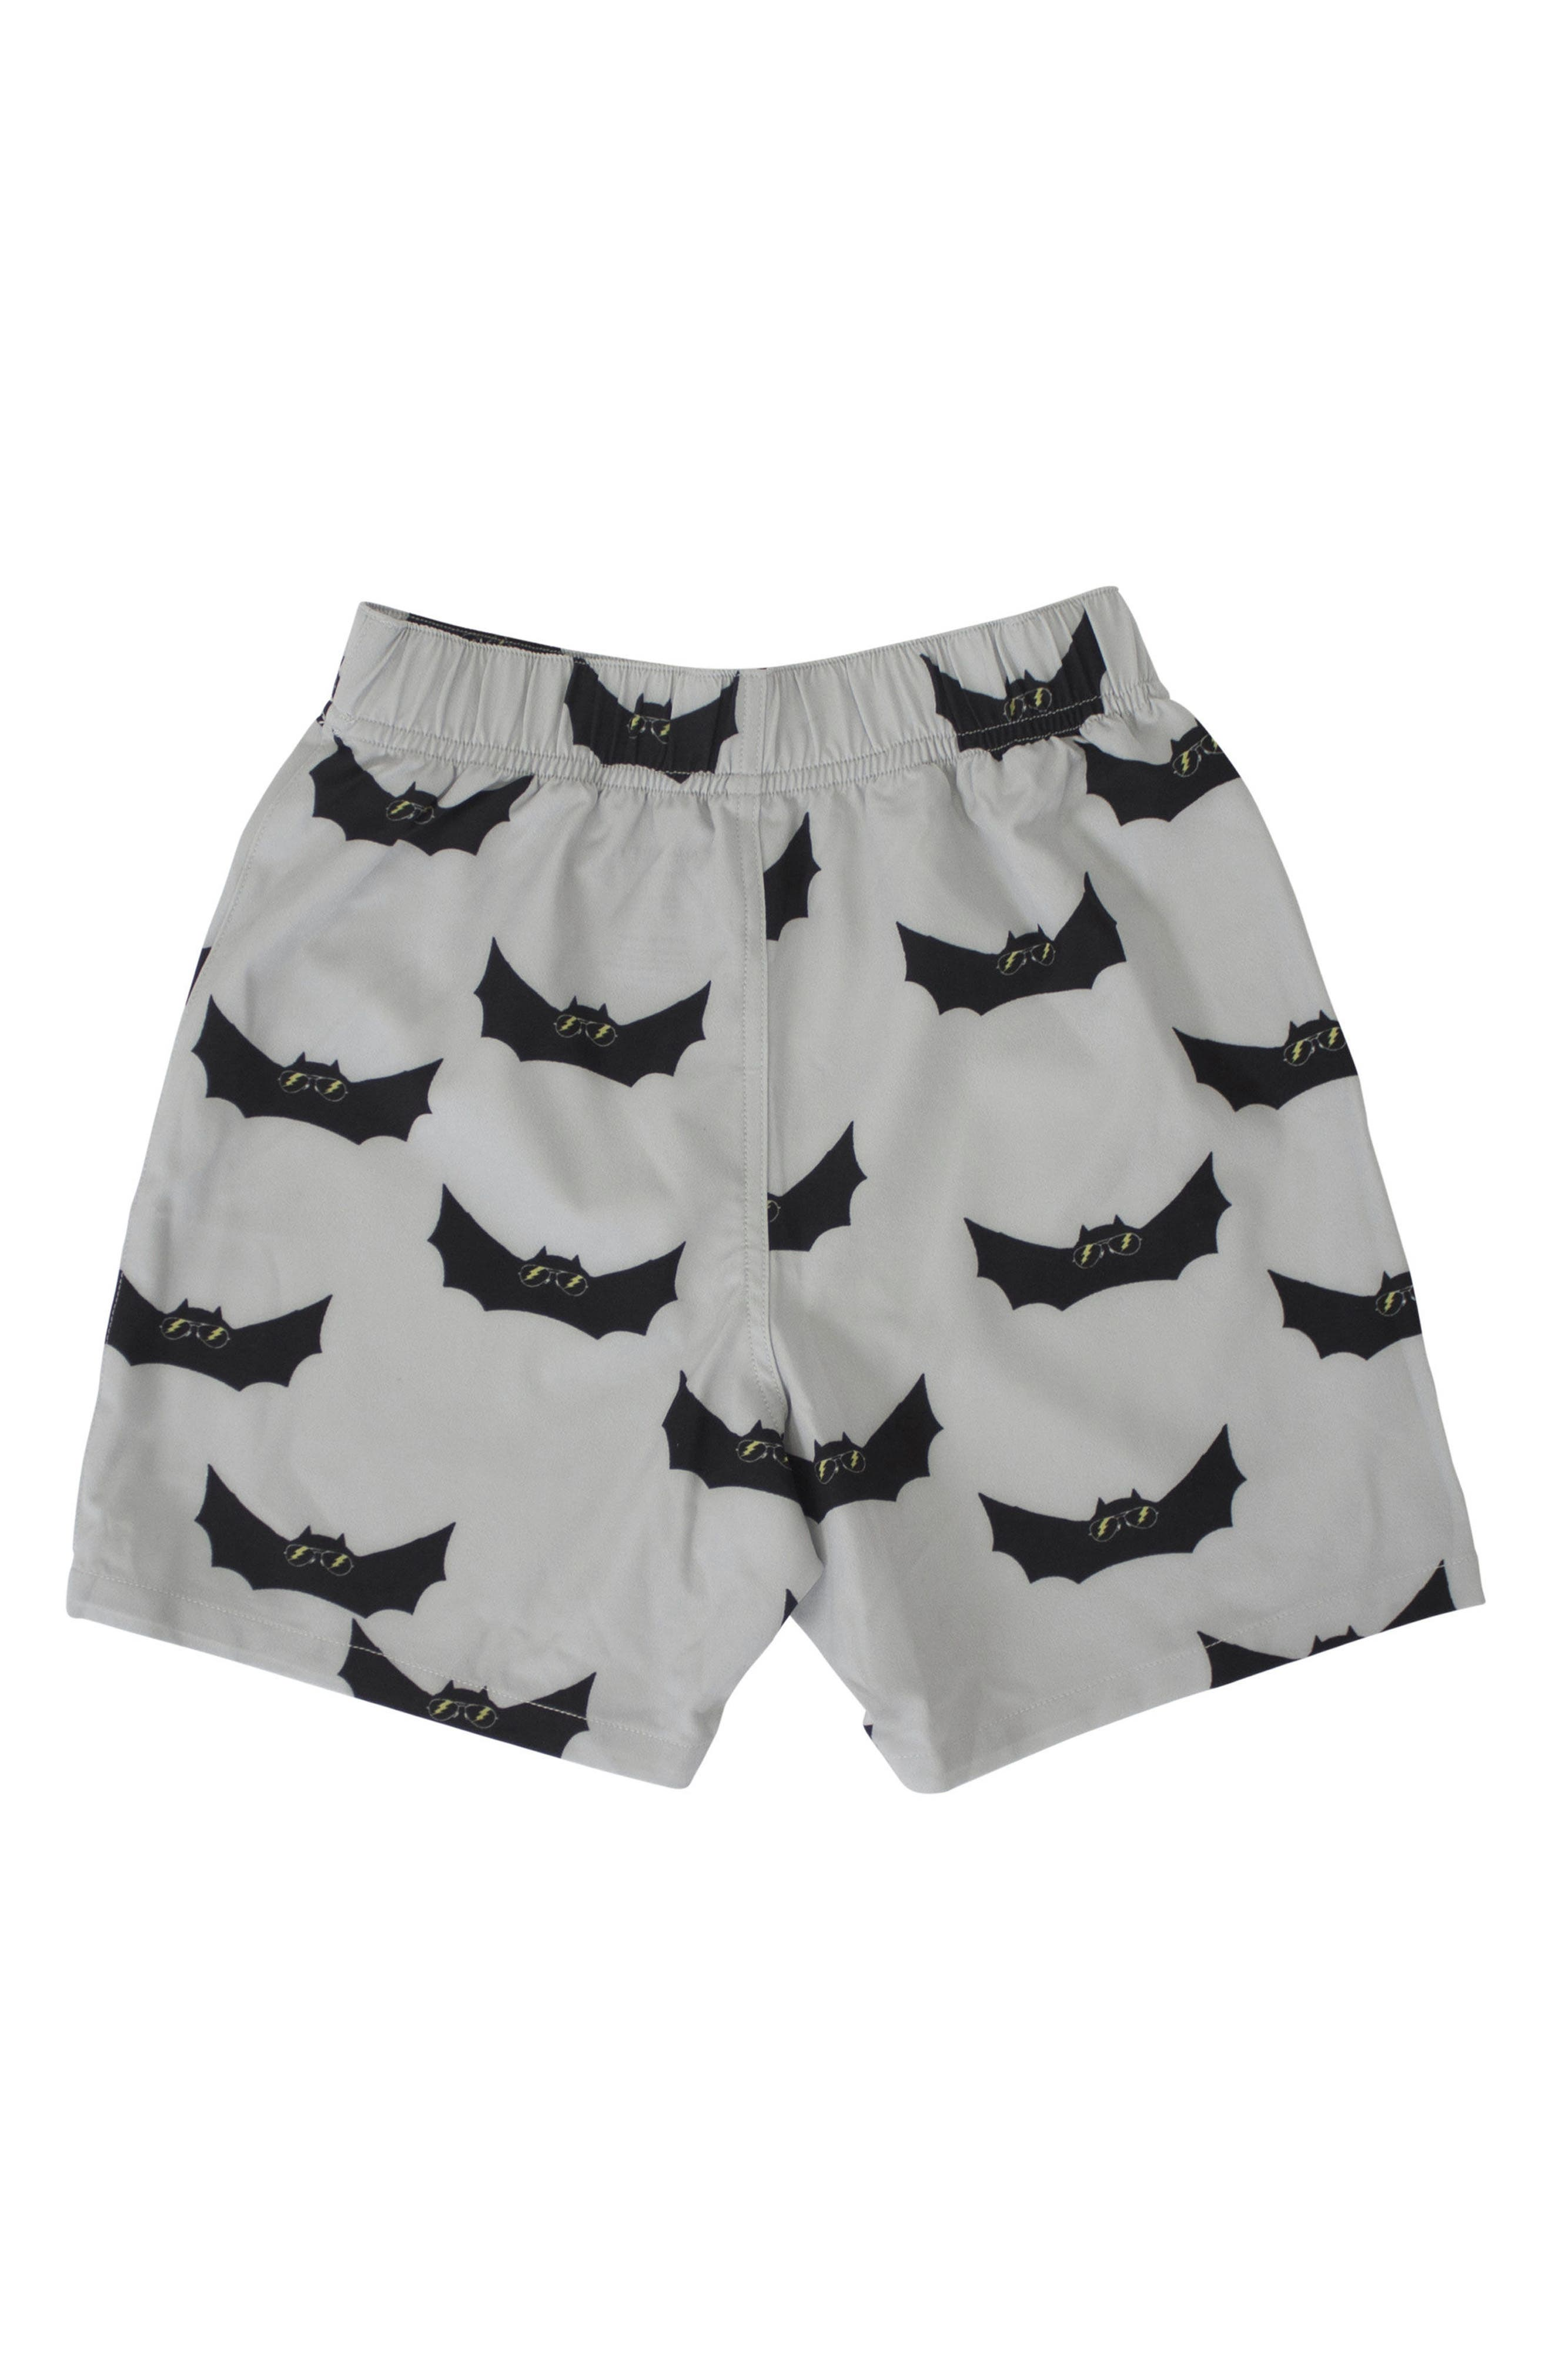 Tiny Tribe Electric Bat Board Shorts (Toddler Boys & Little Boys)